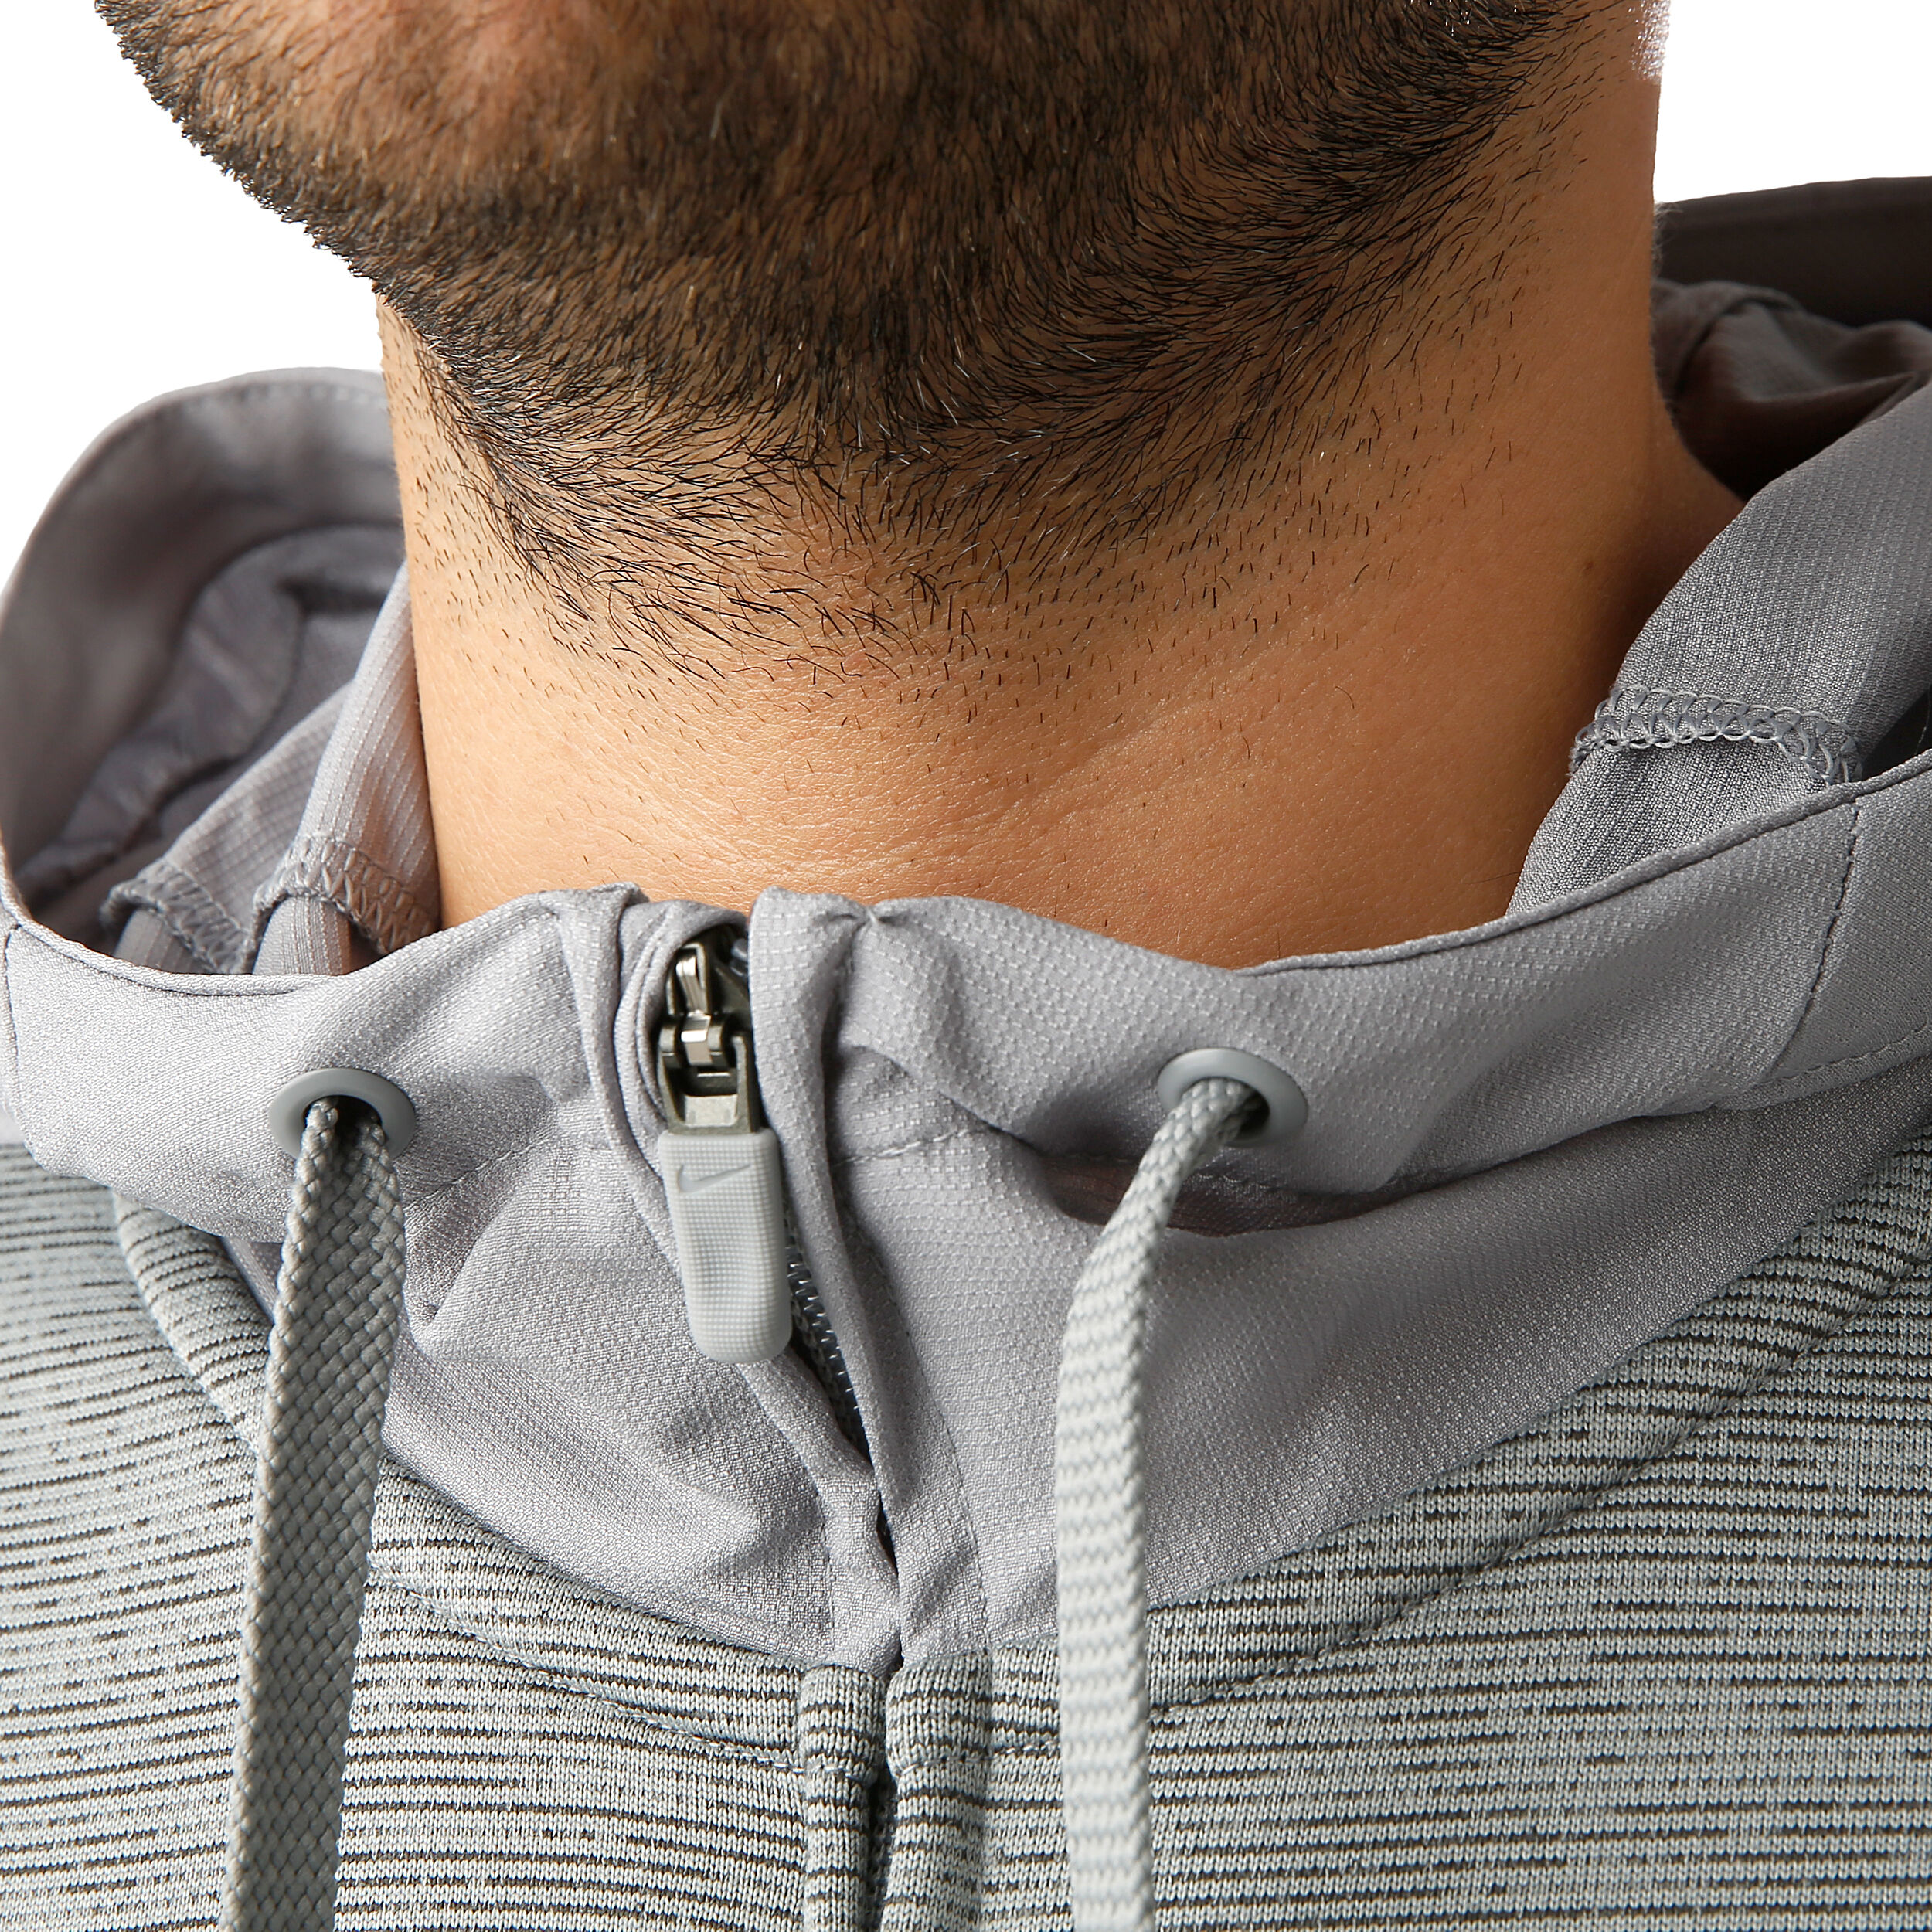 Nike Dri Fit Fleece Full Zip Herren Hellgrau, Grau online